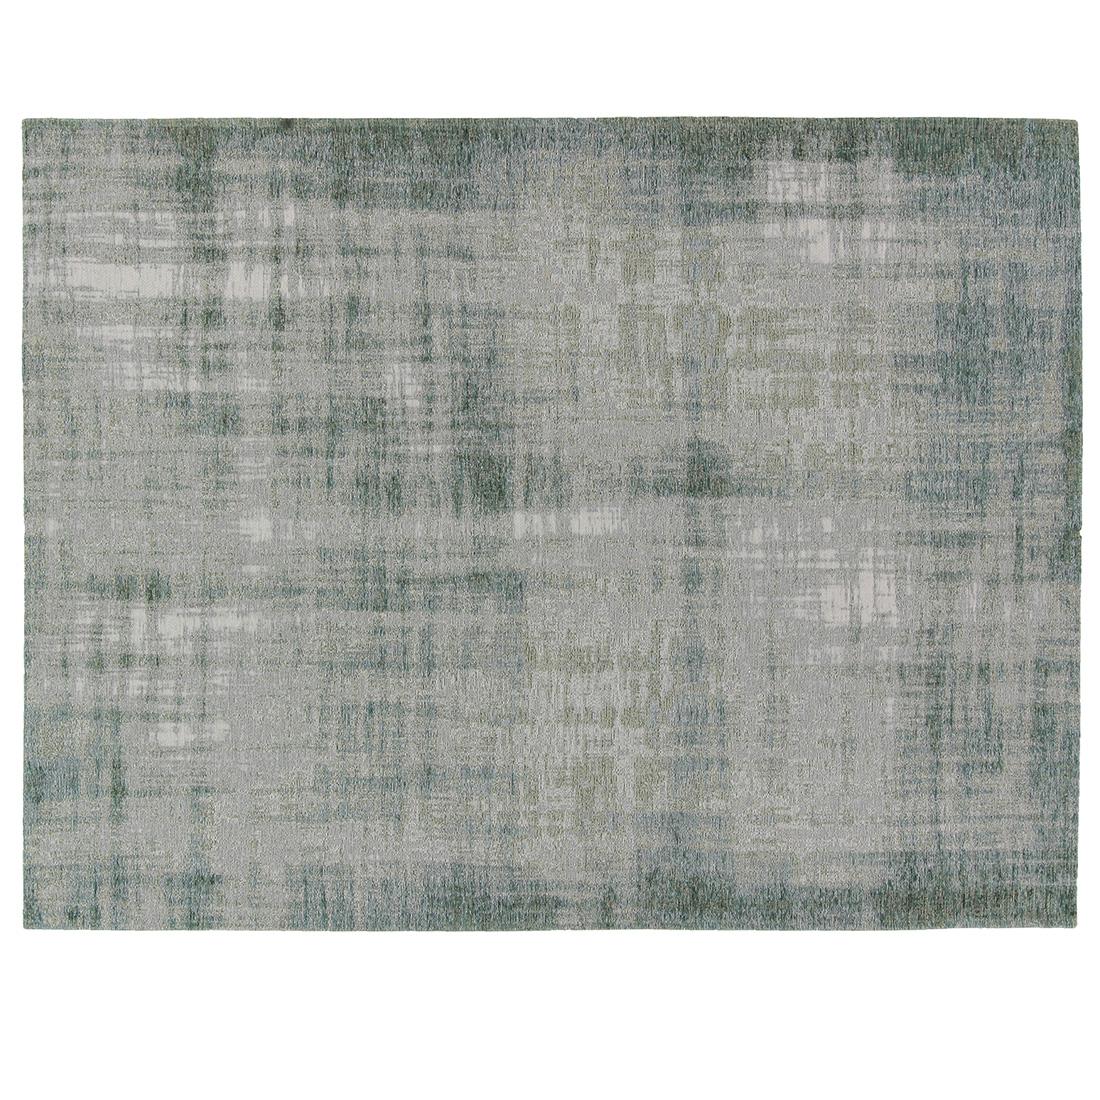 Vloerkleed Brinker Grunge Aqua | 200 x 300 cm